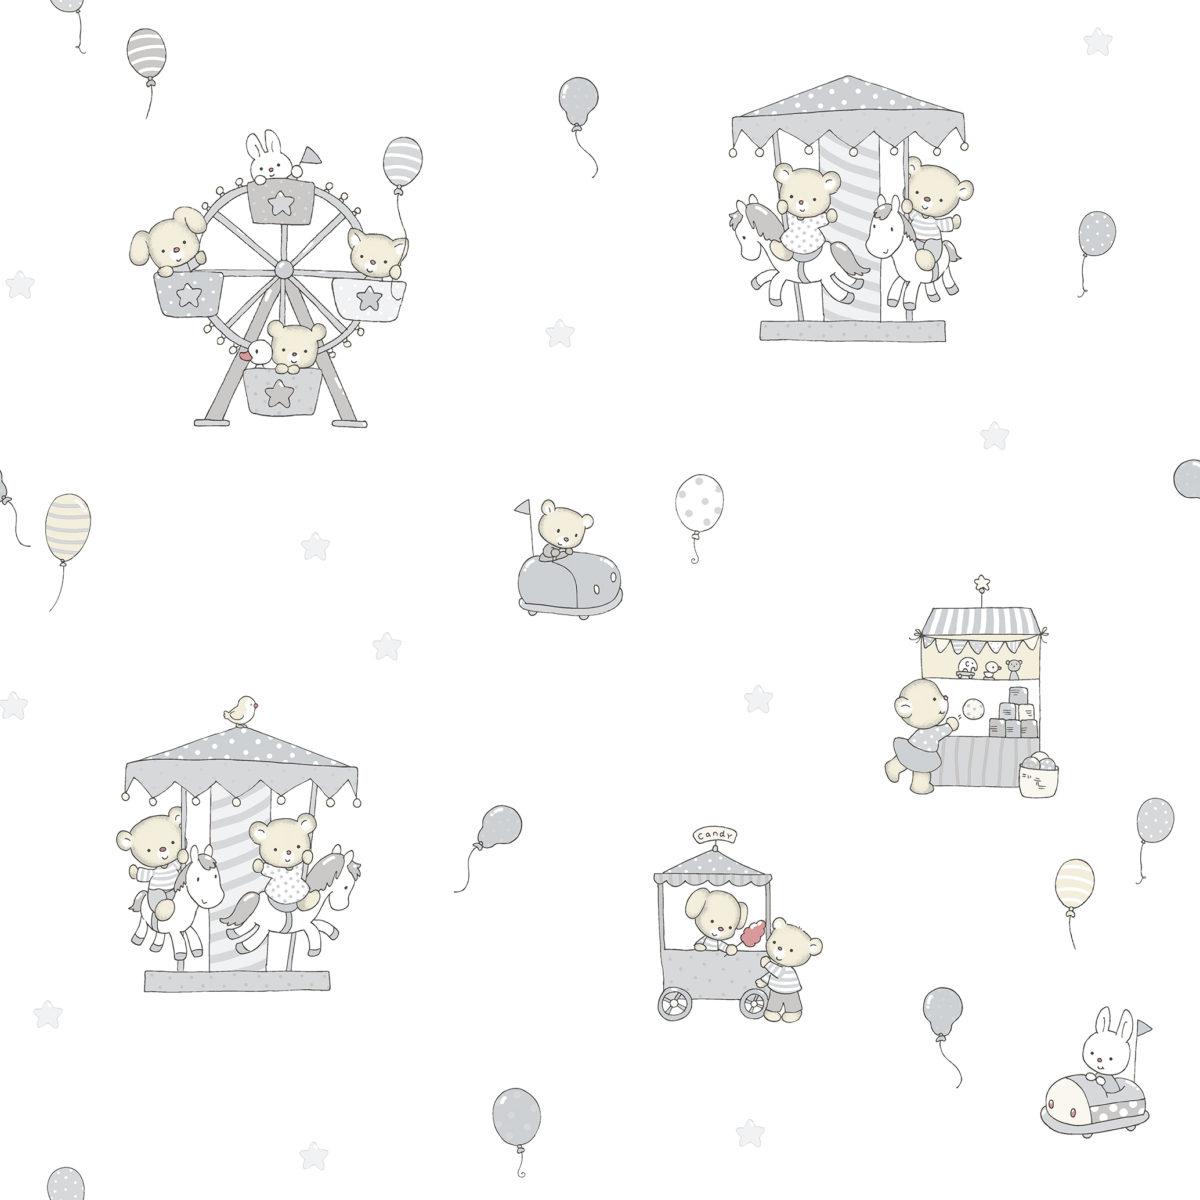 Обои ICH Lullaby 220-3